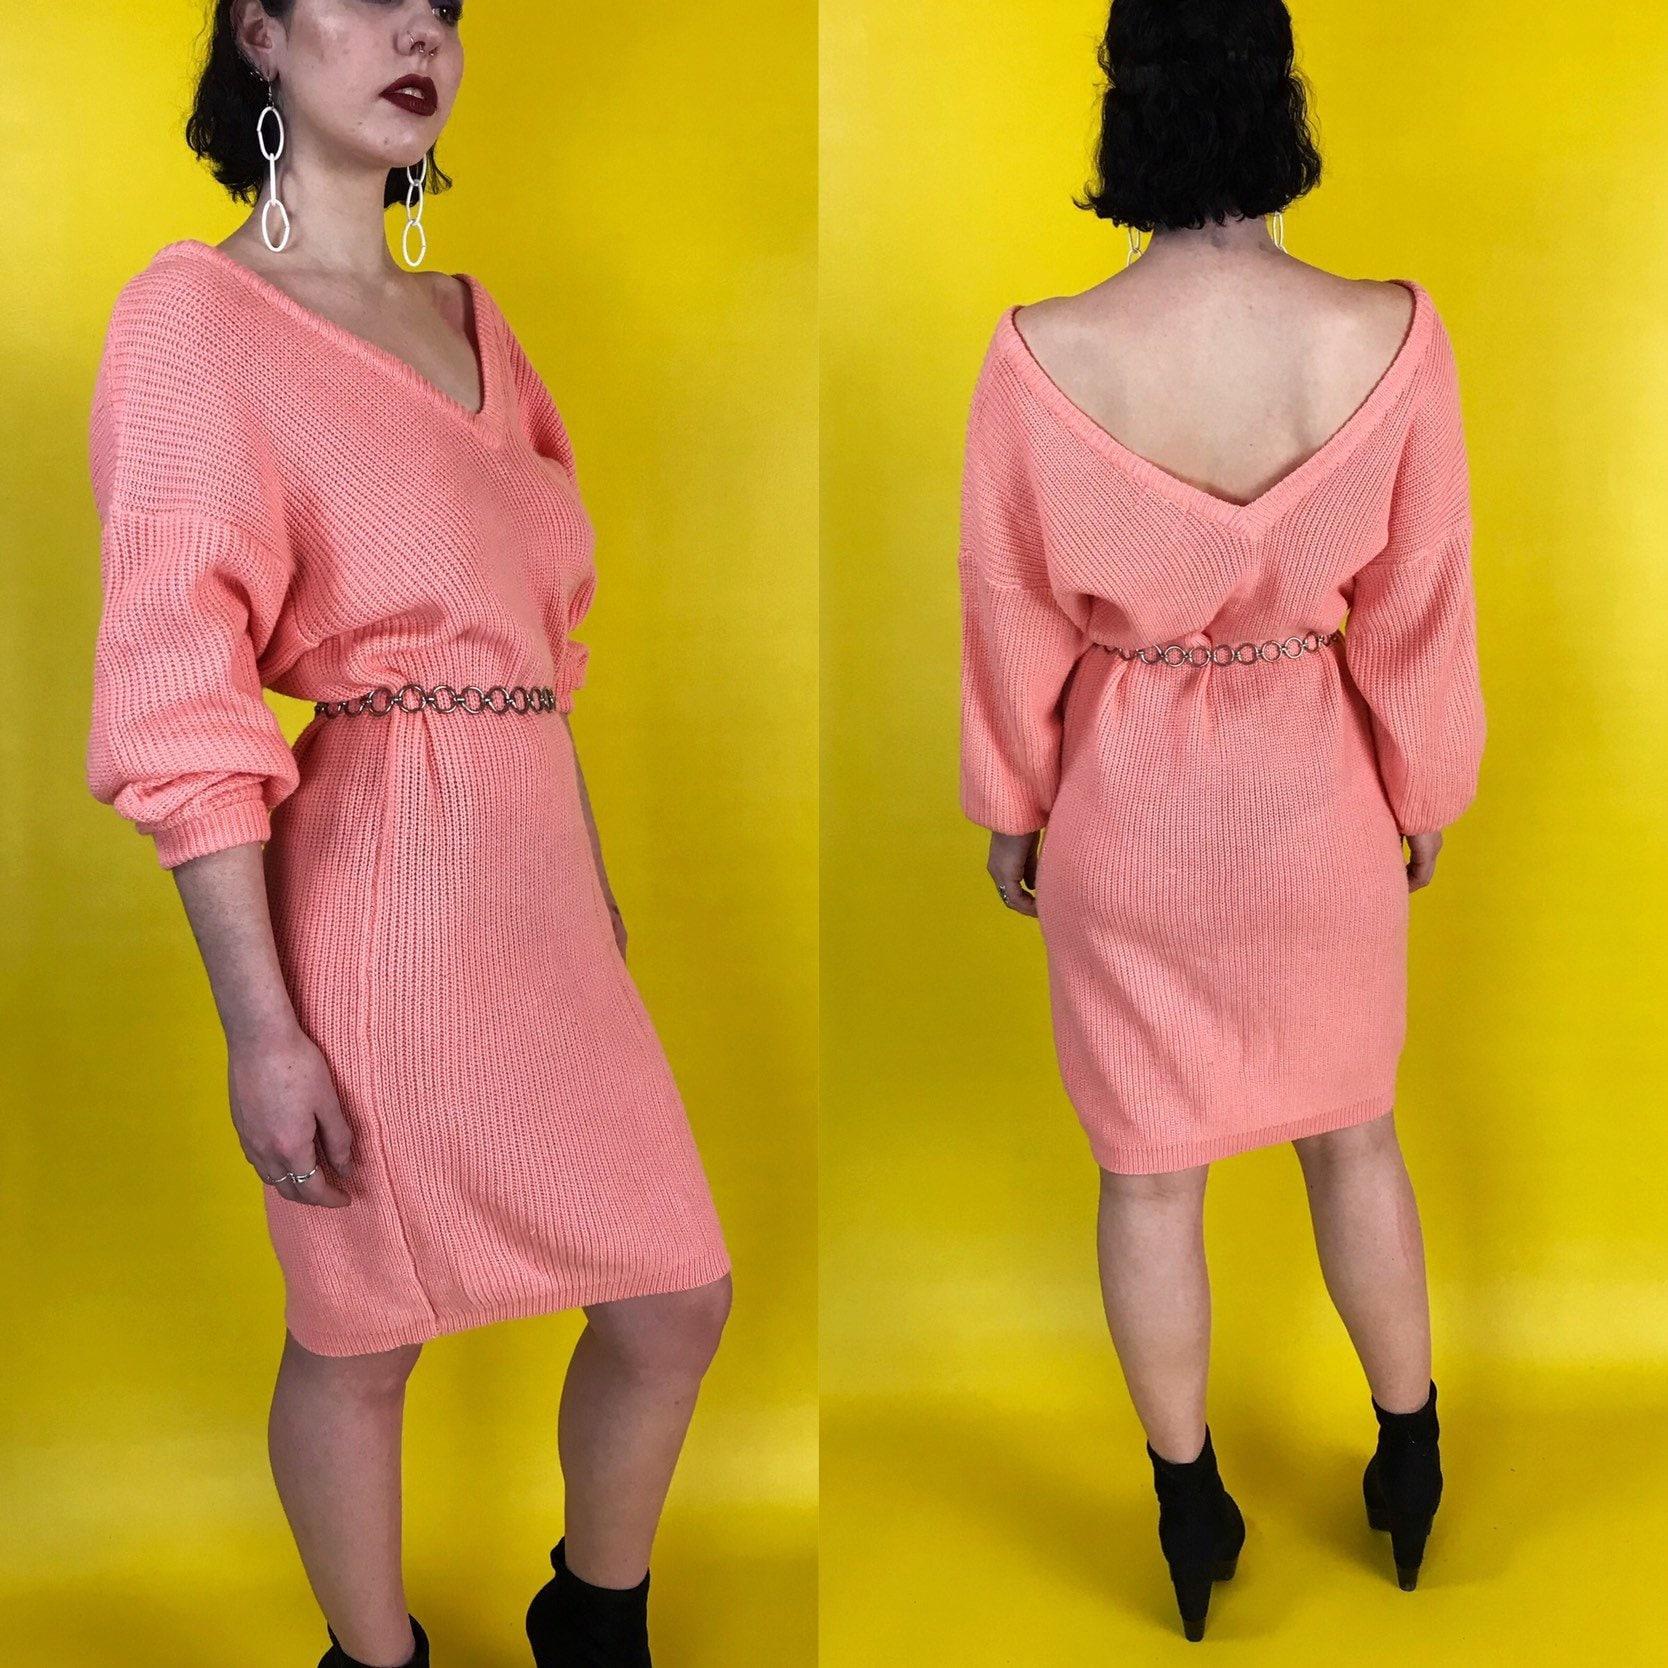 d274b5f66e5 80 s Pink Acrylic Slouchy Knit Sweater Dress Medium - Long Line ...